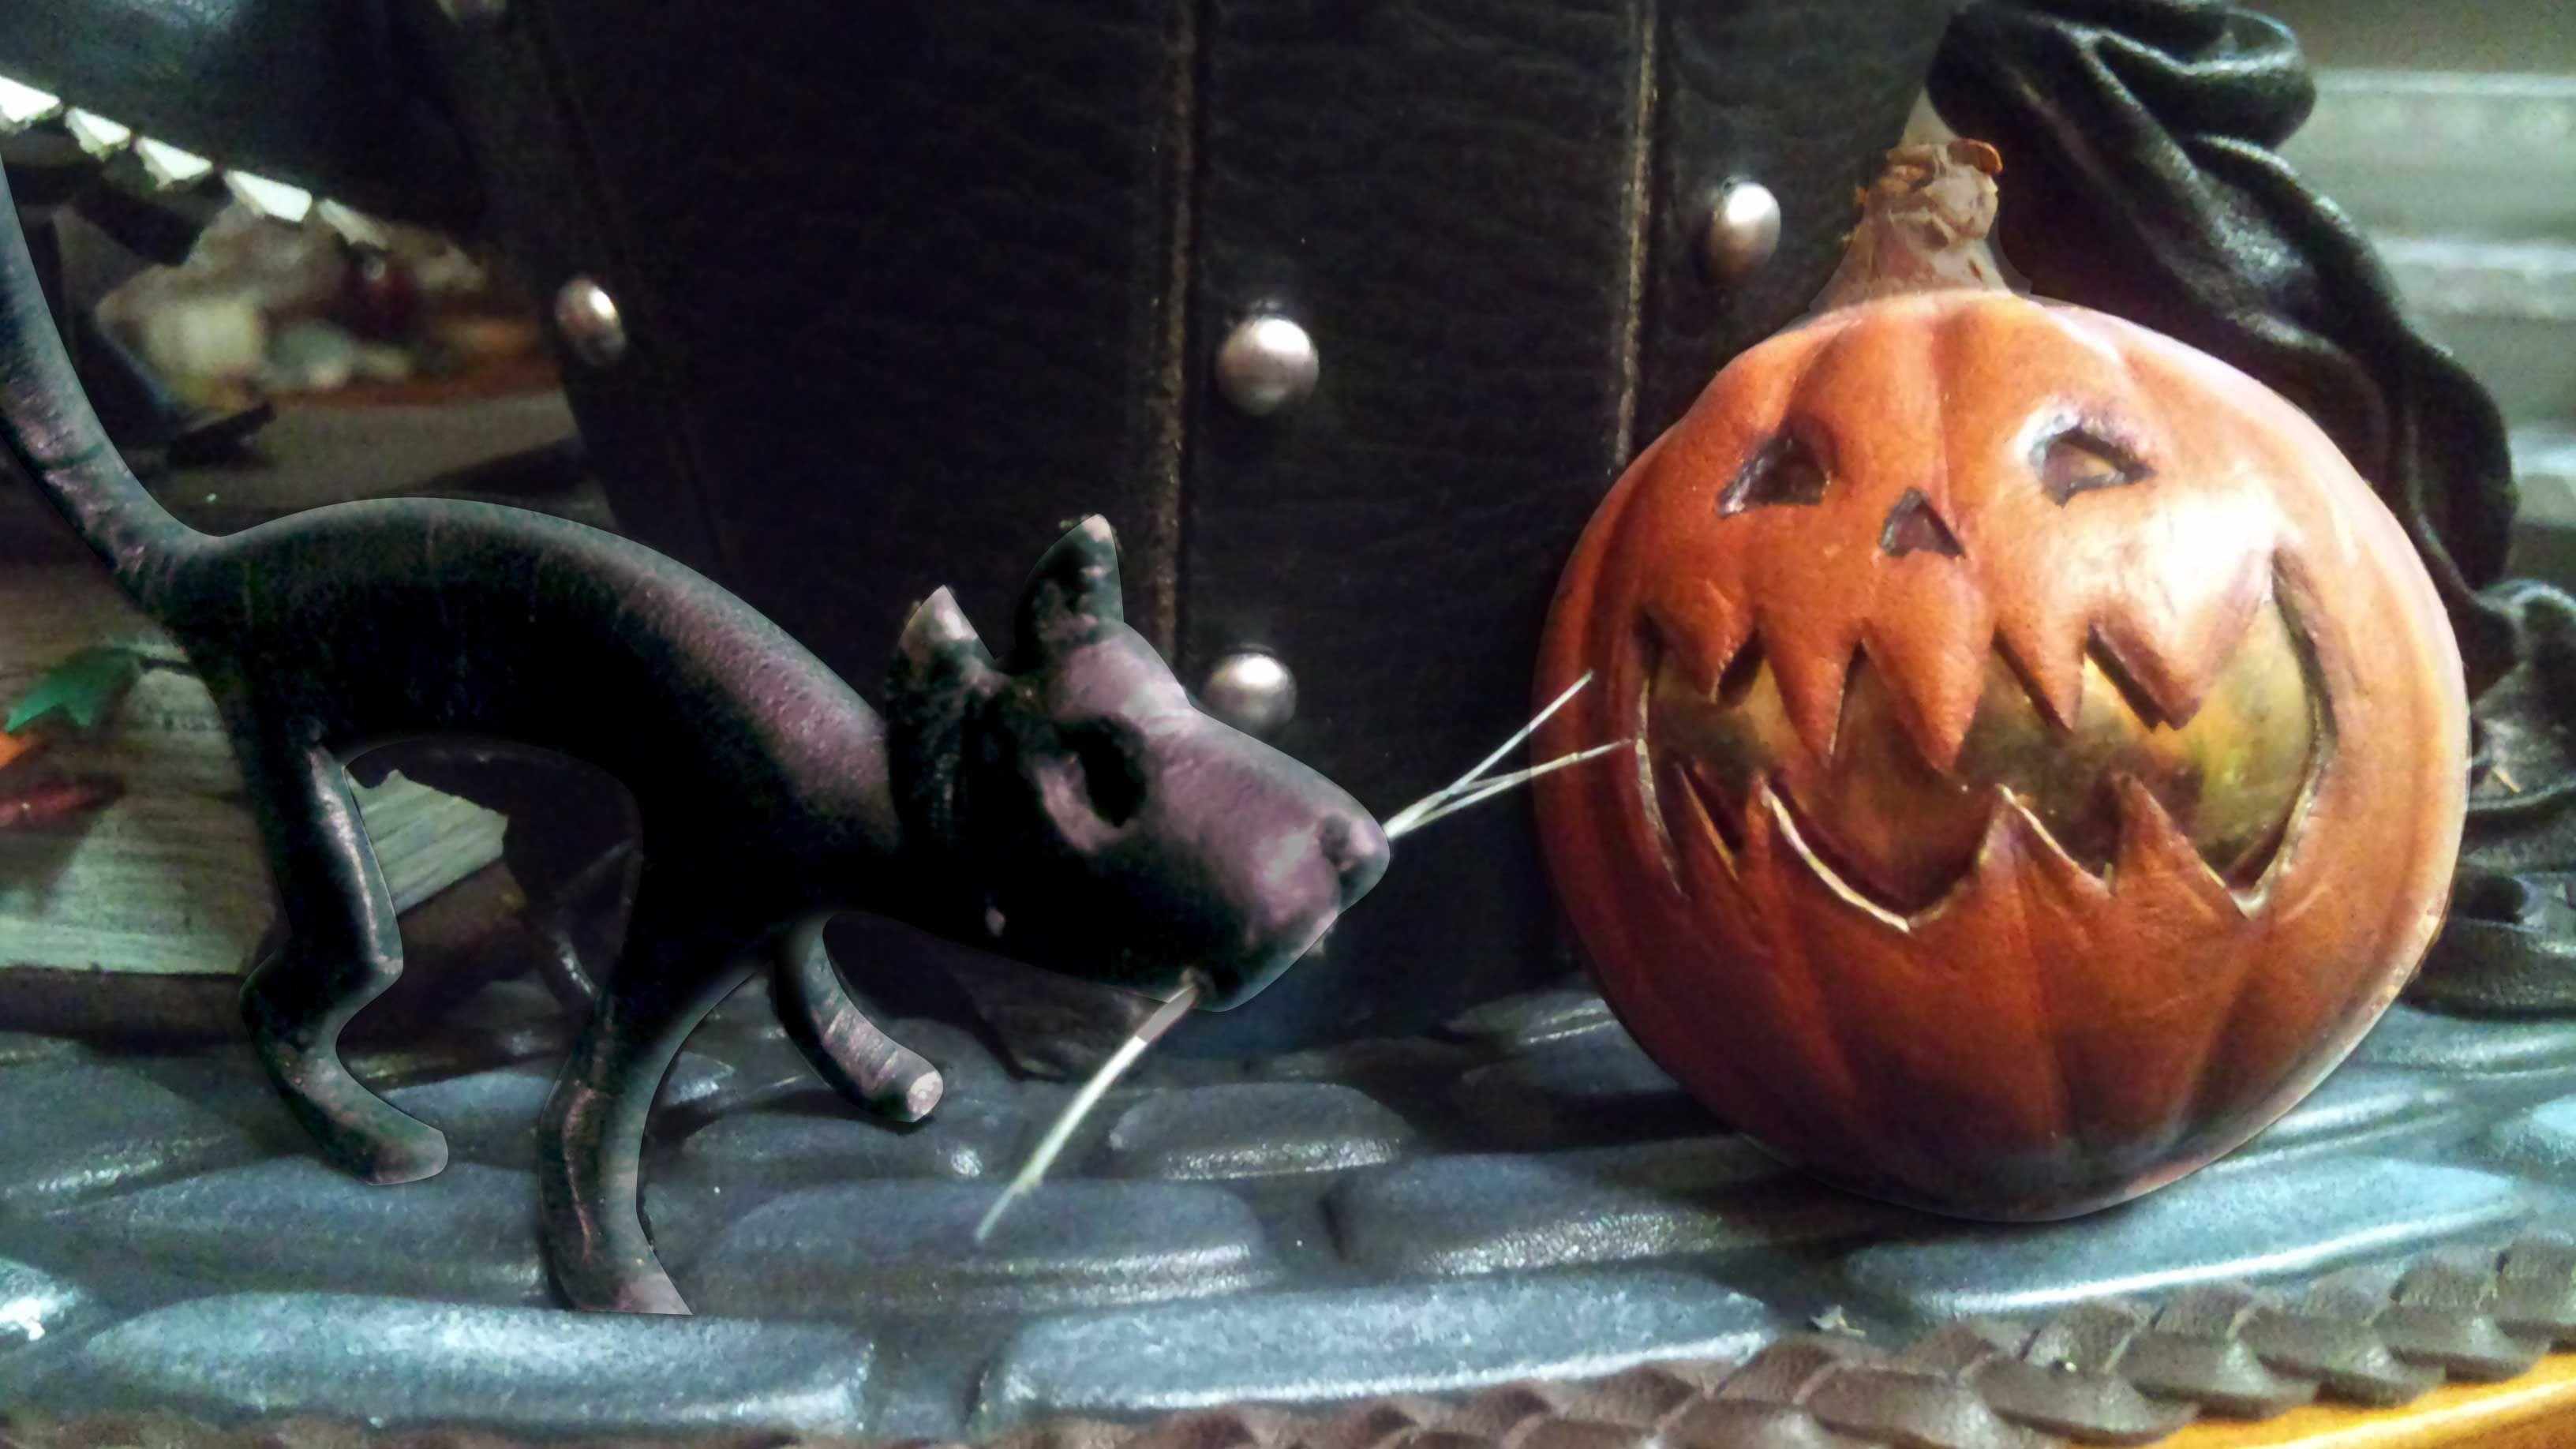 NBX Flash Movie. Leather Sculpture with Misting FX by MedusaWood.deviantart.com on @DeviantArt